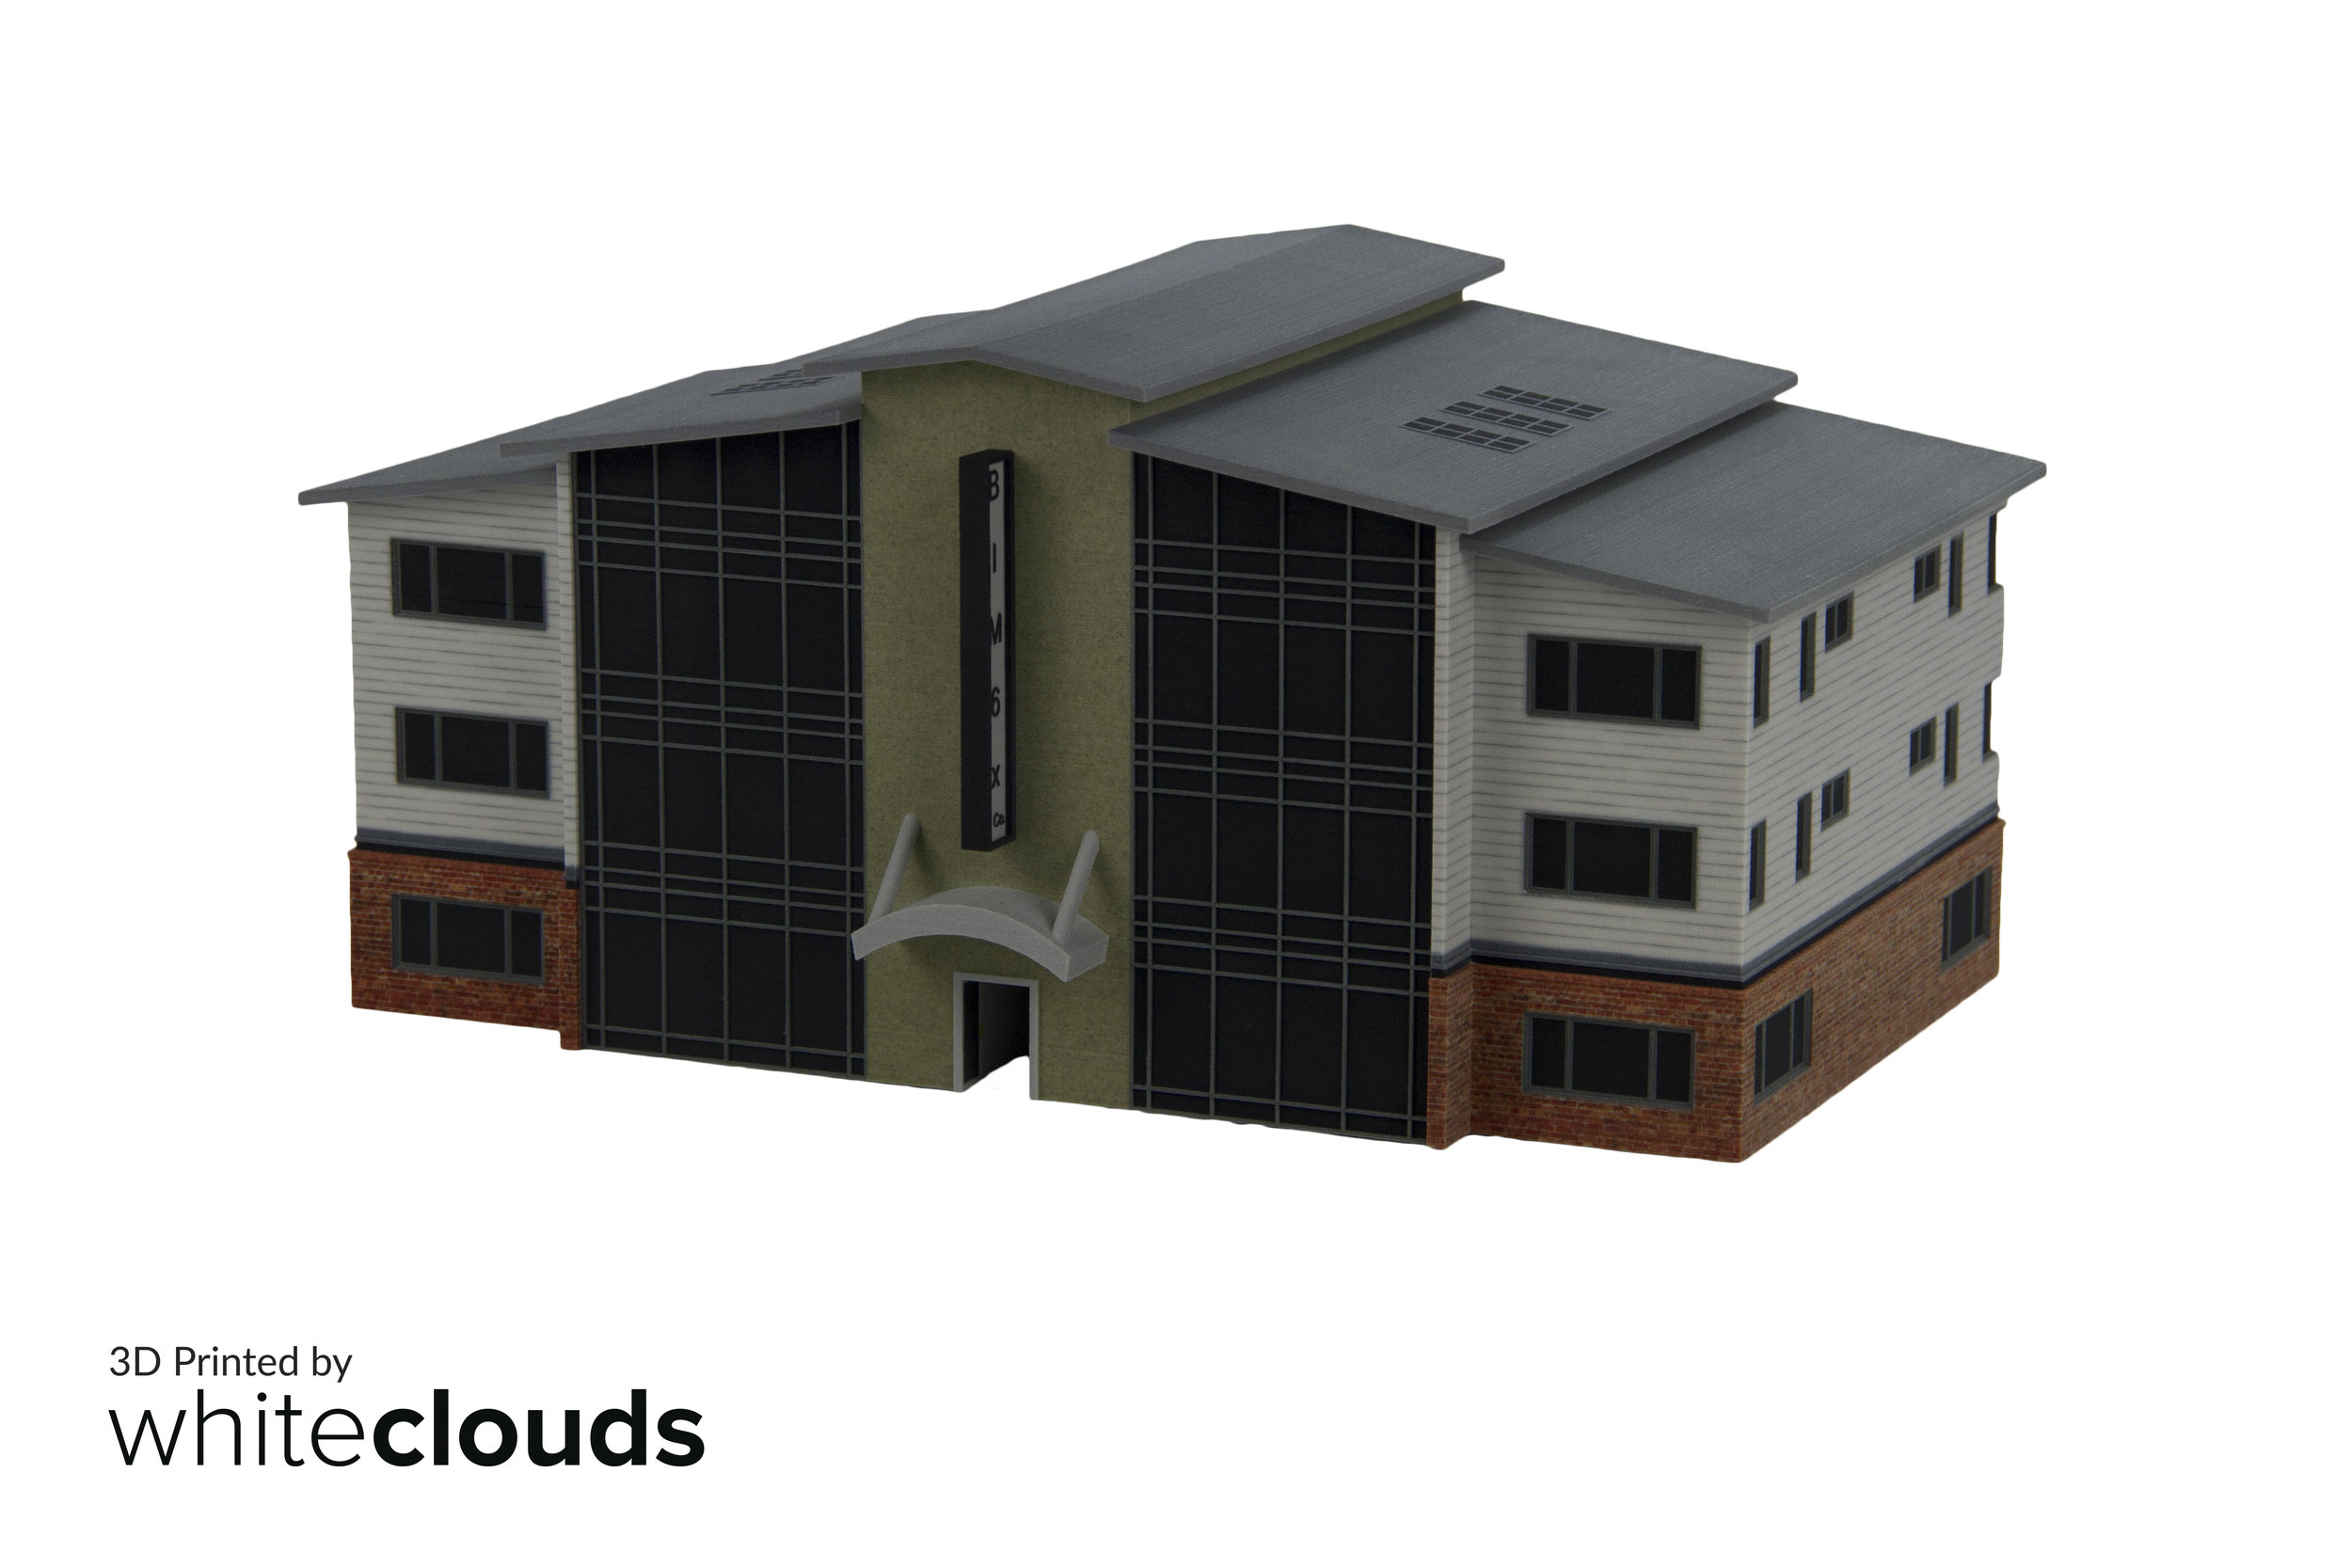 3D-Printed-WhiteCloud-BIM6x-2-Architecture-BIM6x-CR2-1.jpg